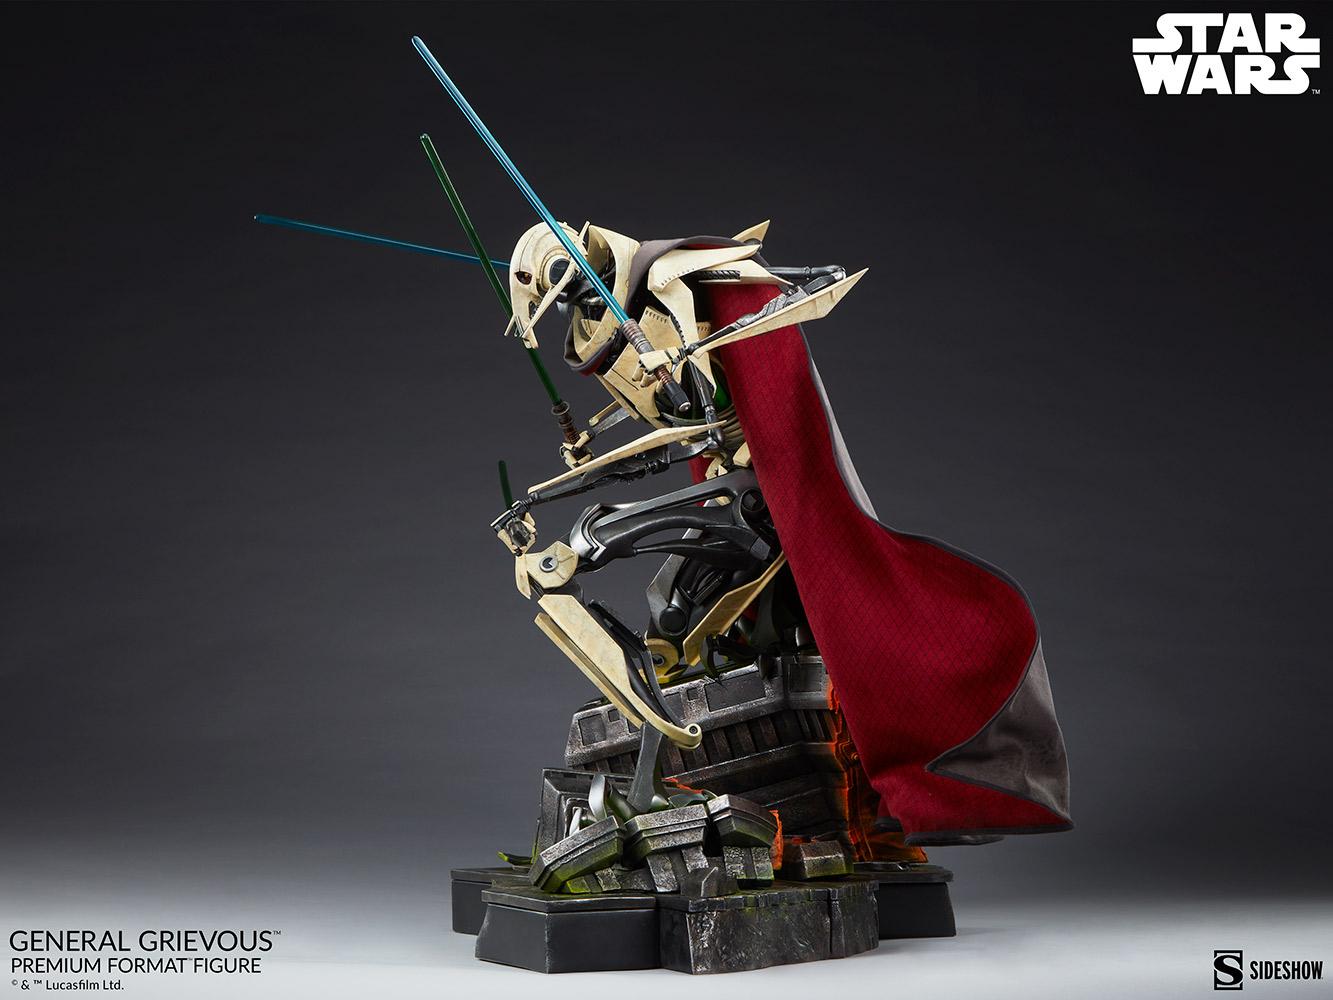 Star Wars: Revenge of the Sith : General Grievous Premium Format Figure General-grievous_star-wars_gallery_6155e660b6e7b